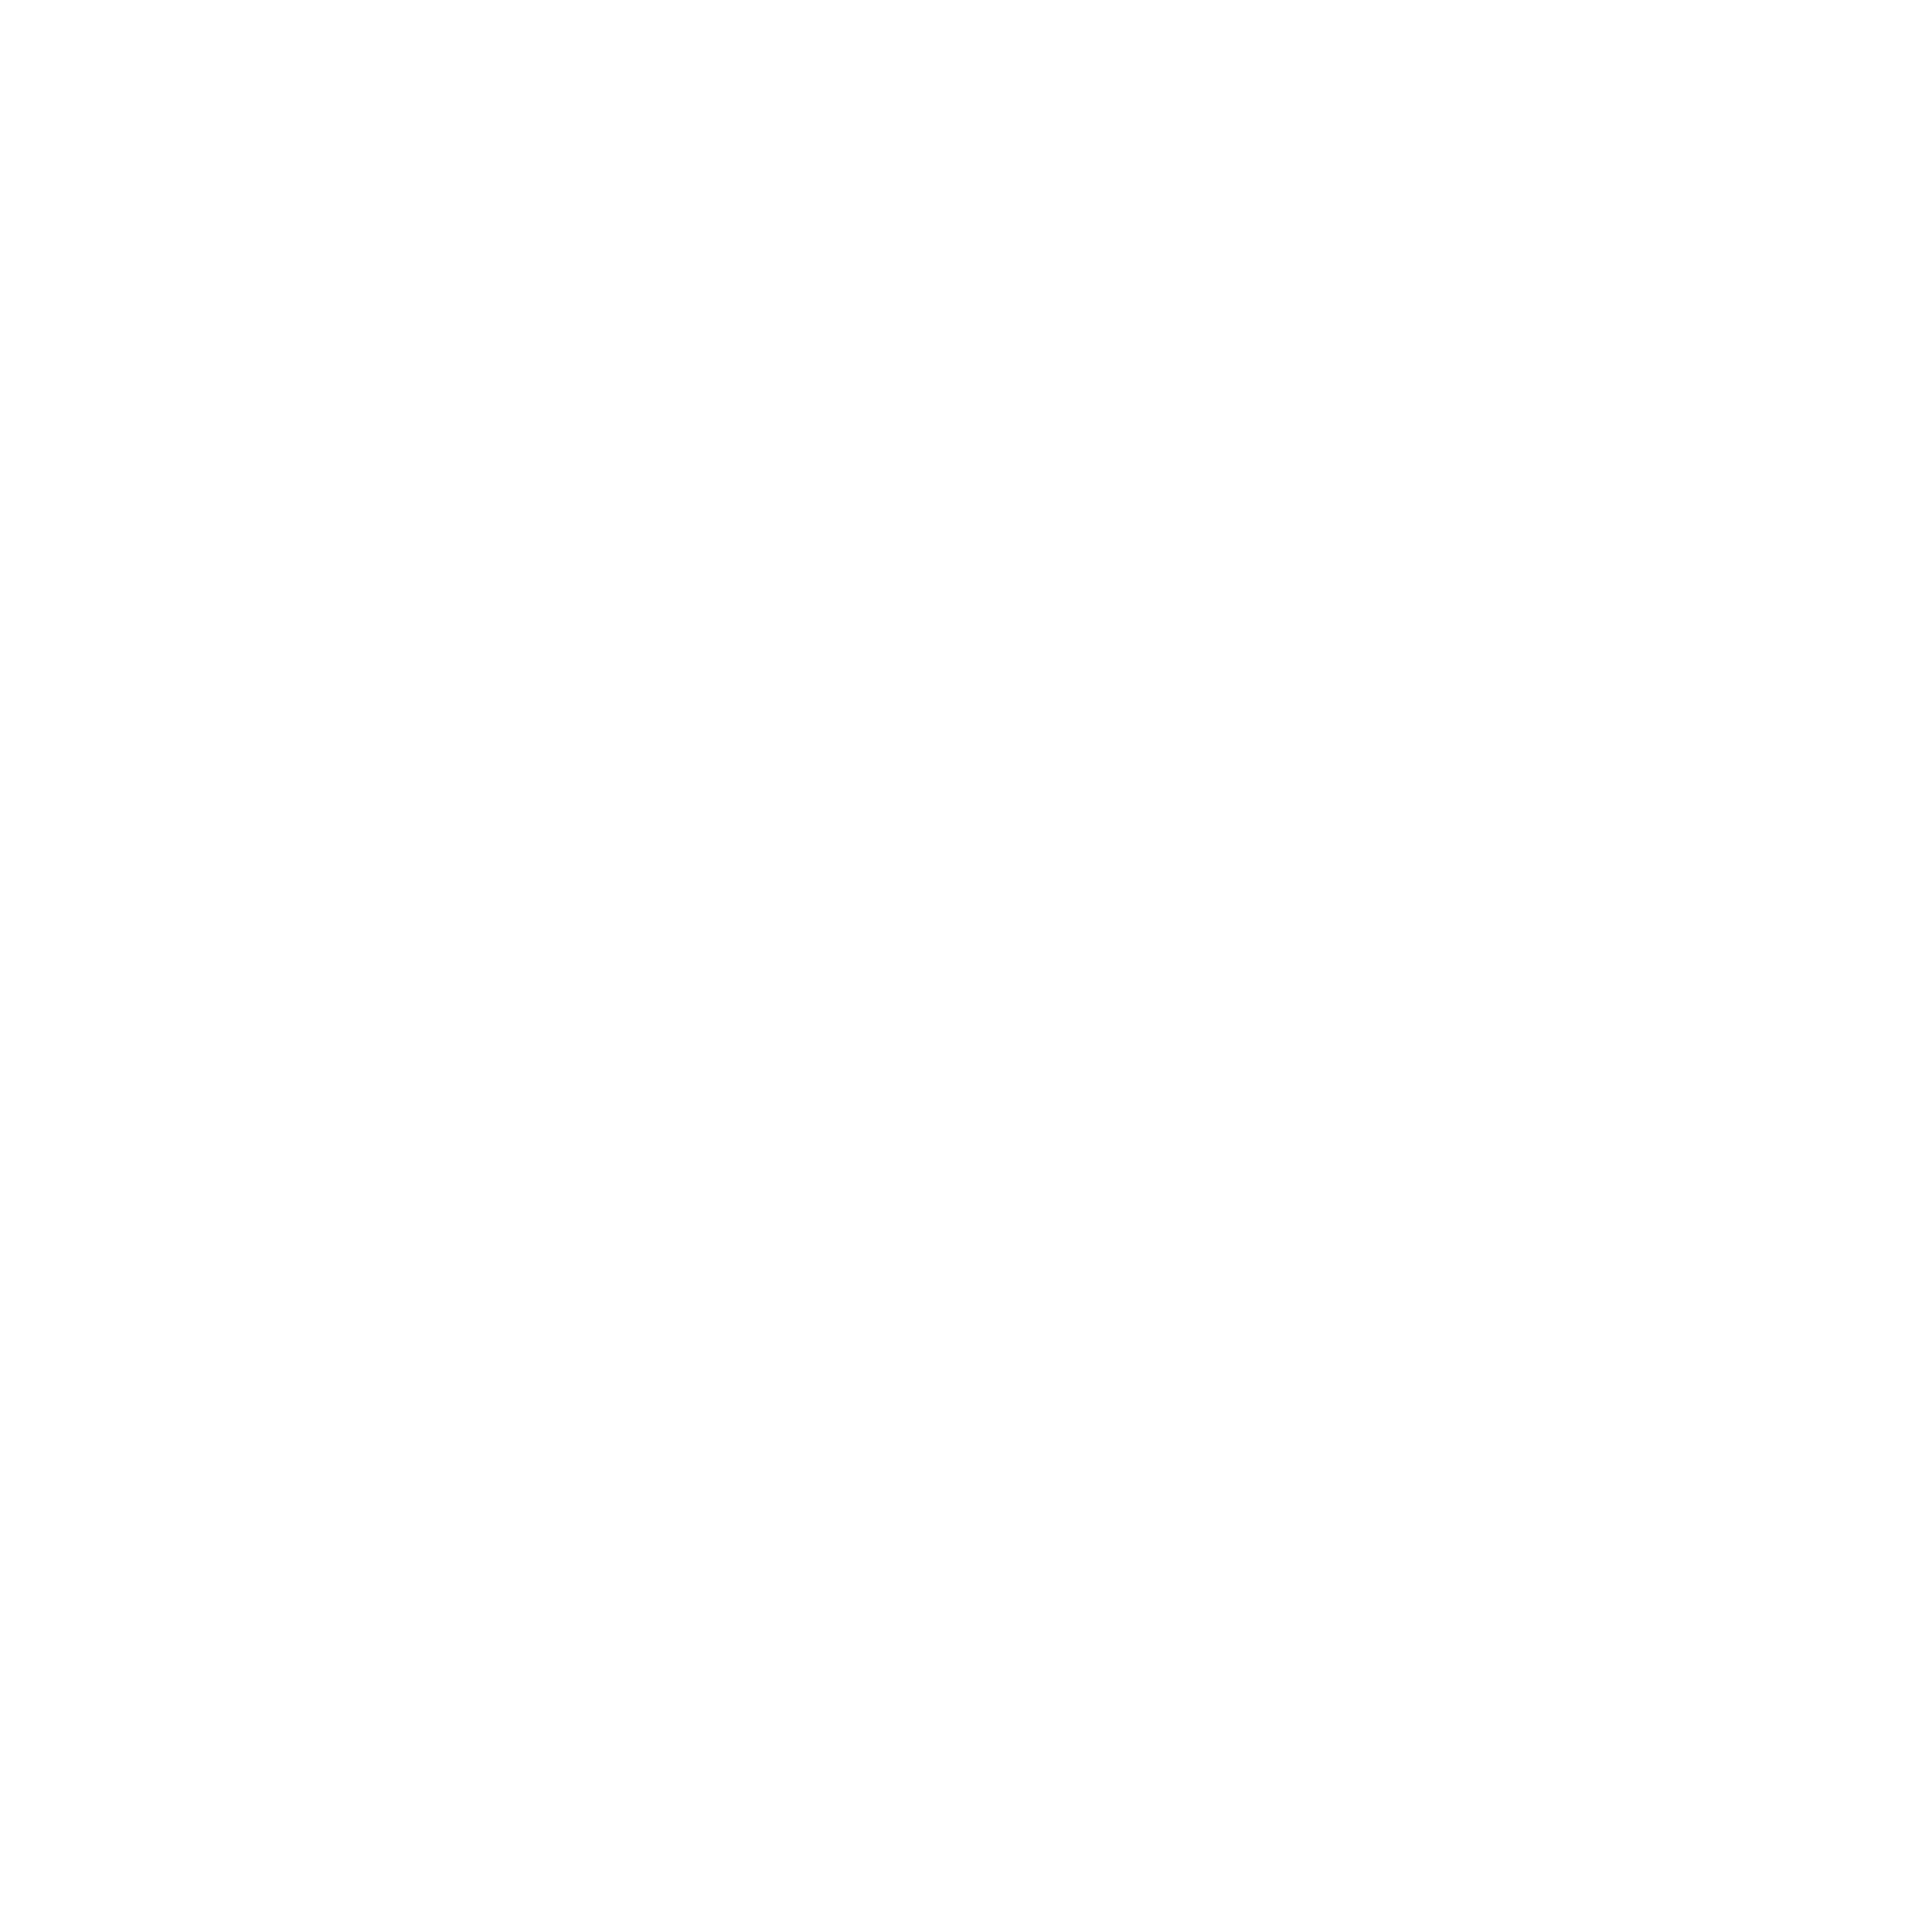 pexels-guillaume-meurice-2460436